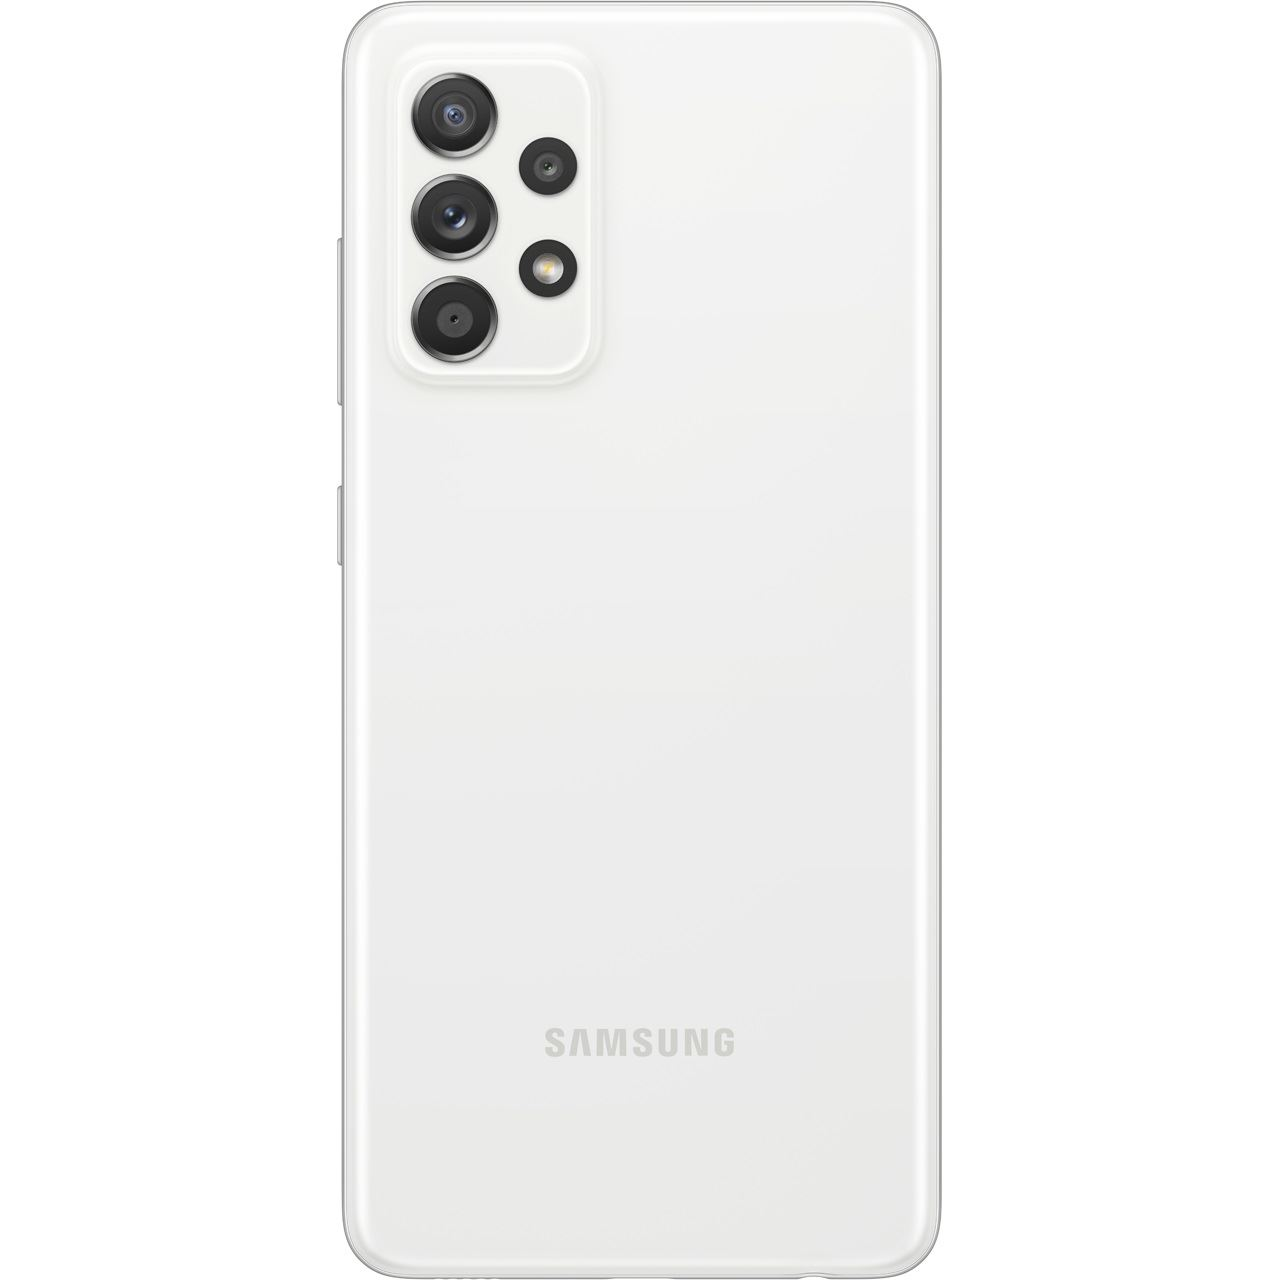 Samsung Galaxy A52 5G 256GB, A526B, weiss - Smartphones ohne Vertrag